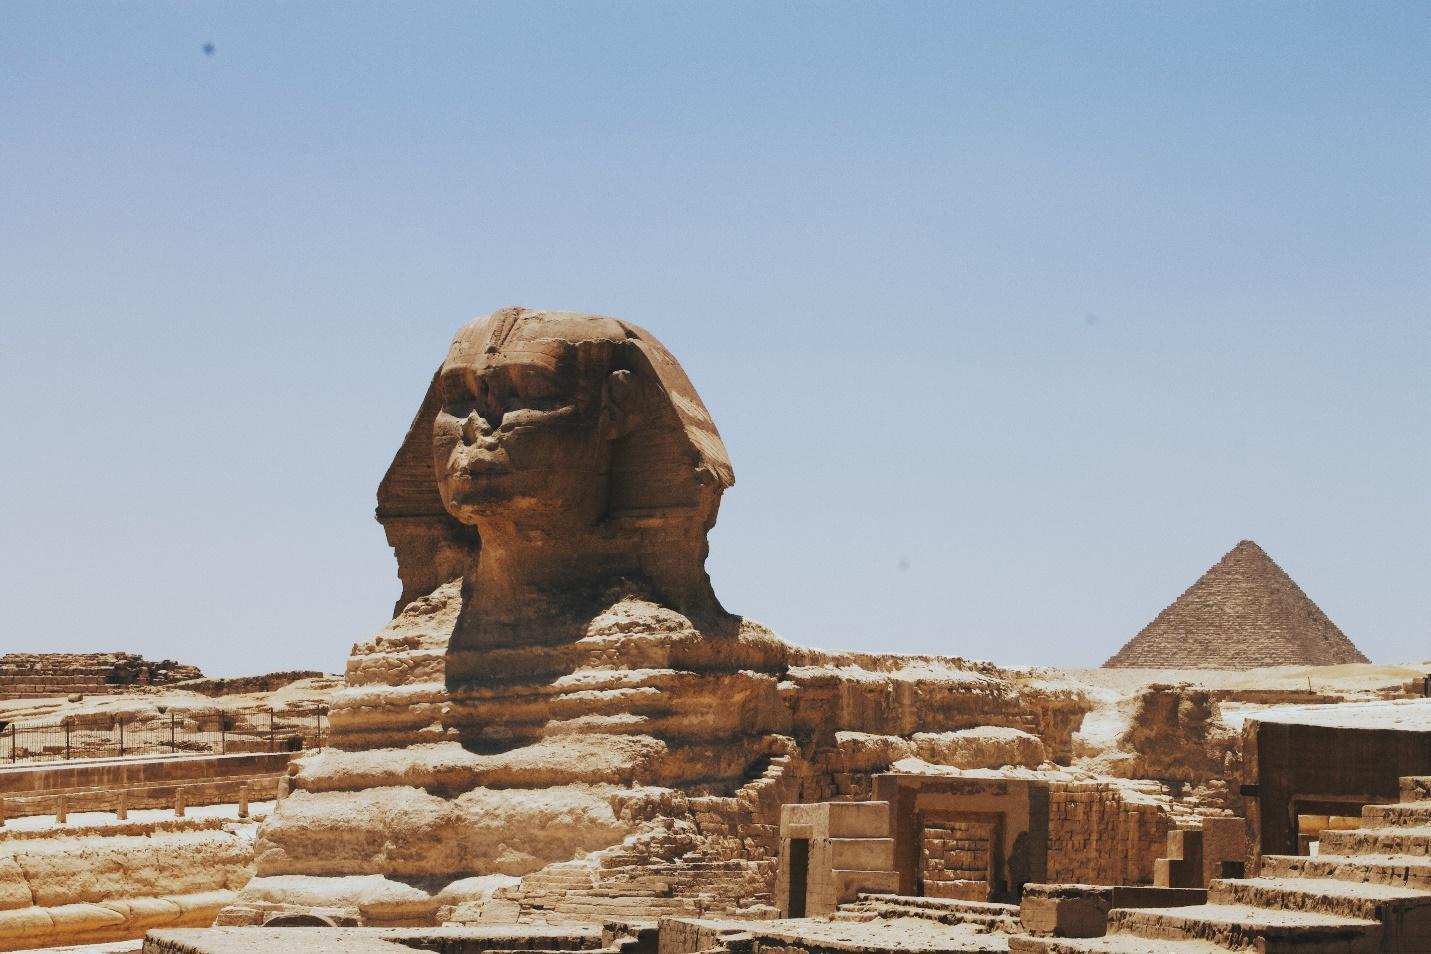 C:\Users\Shrutika Yadav\Downloads\pyramids-of-giza-egypt.jpg